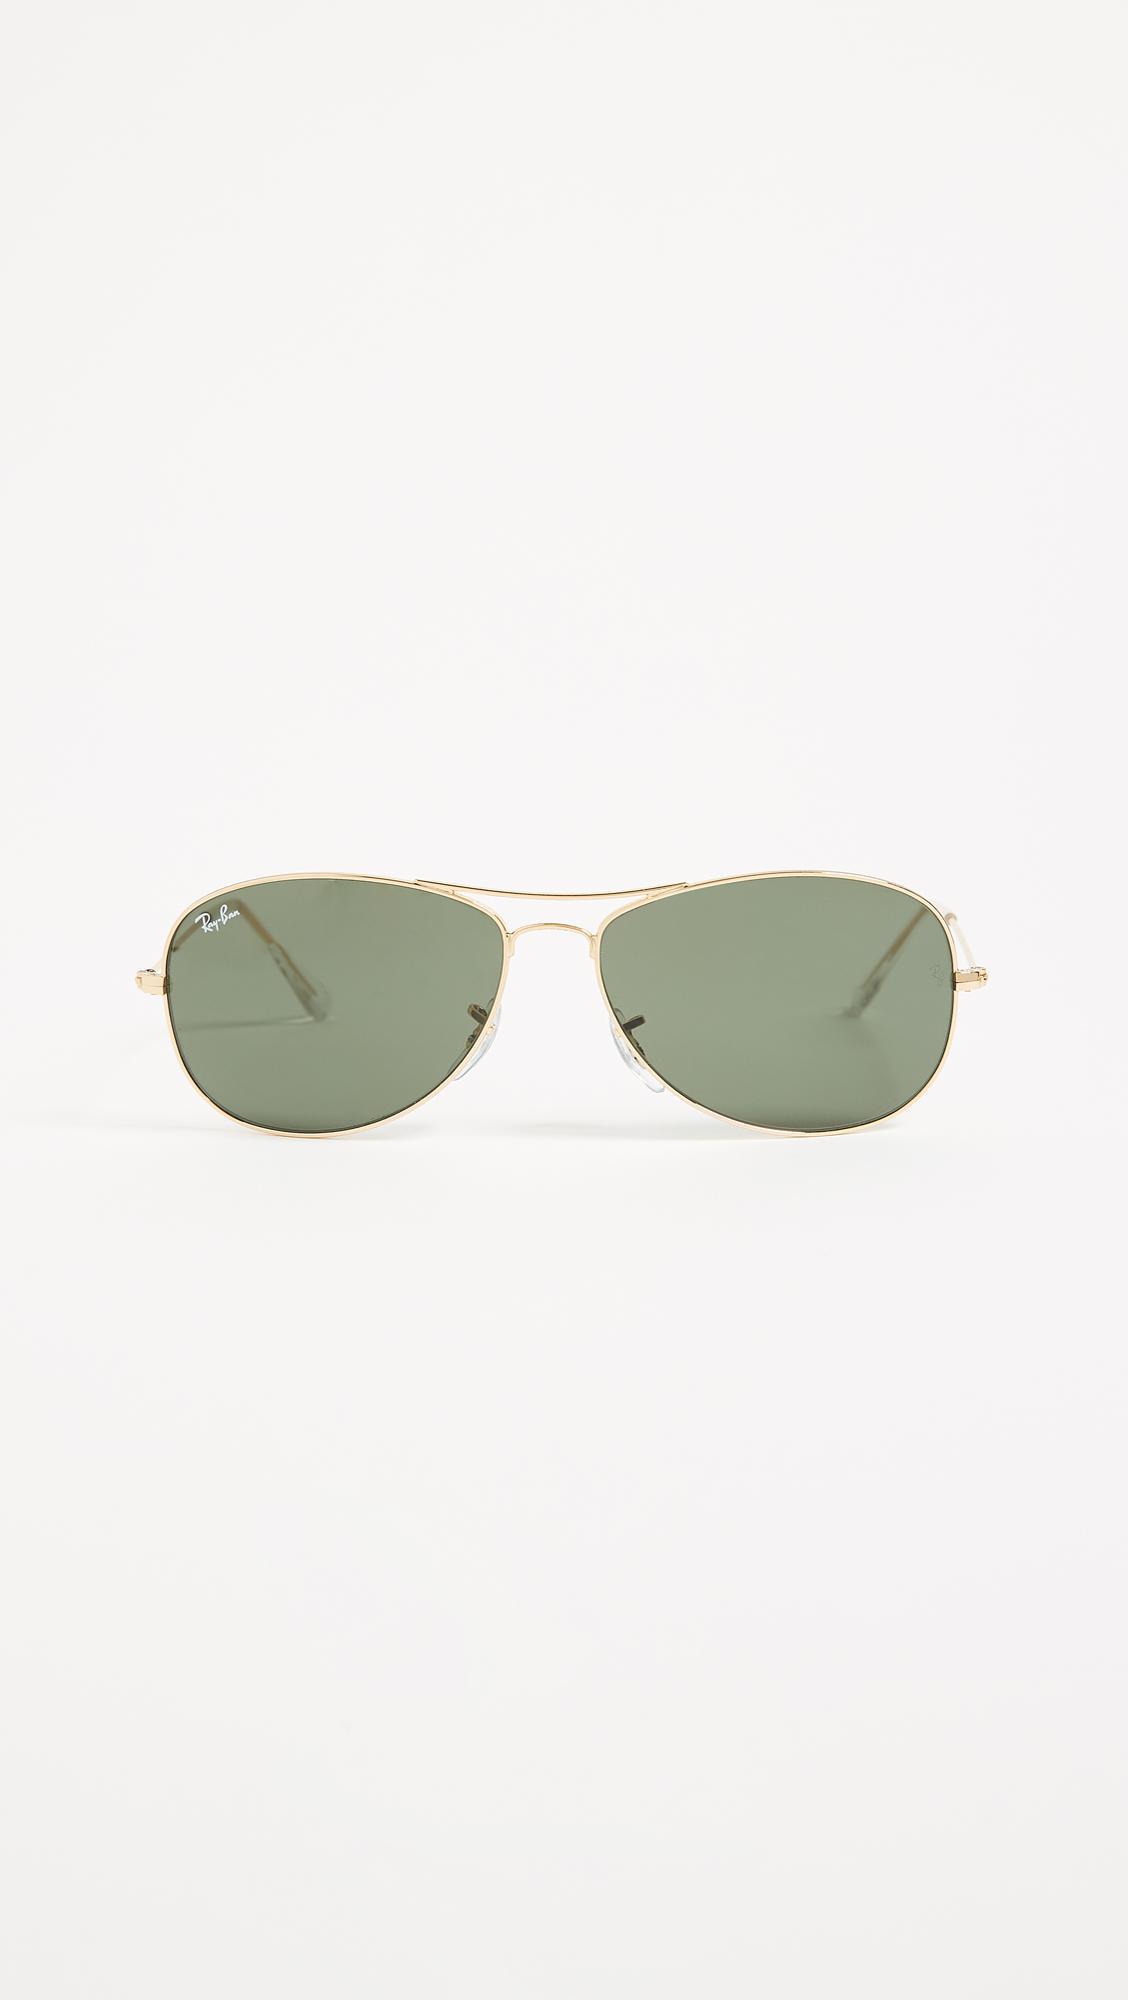 89d3d7fb074 Ray Ban Men s Cockpit Sunglasses W Green Lens Gunmetal « One More Soul